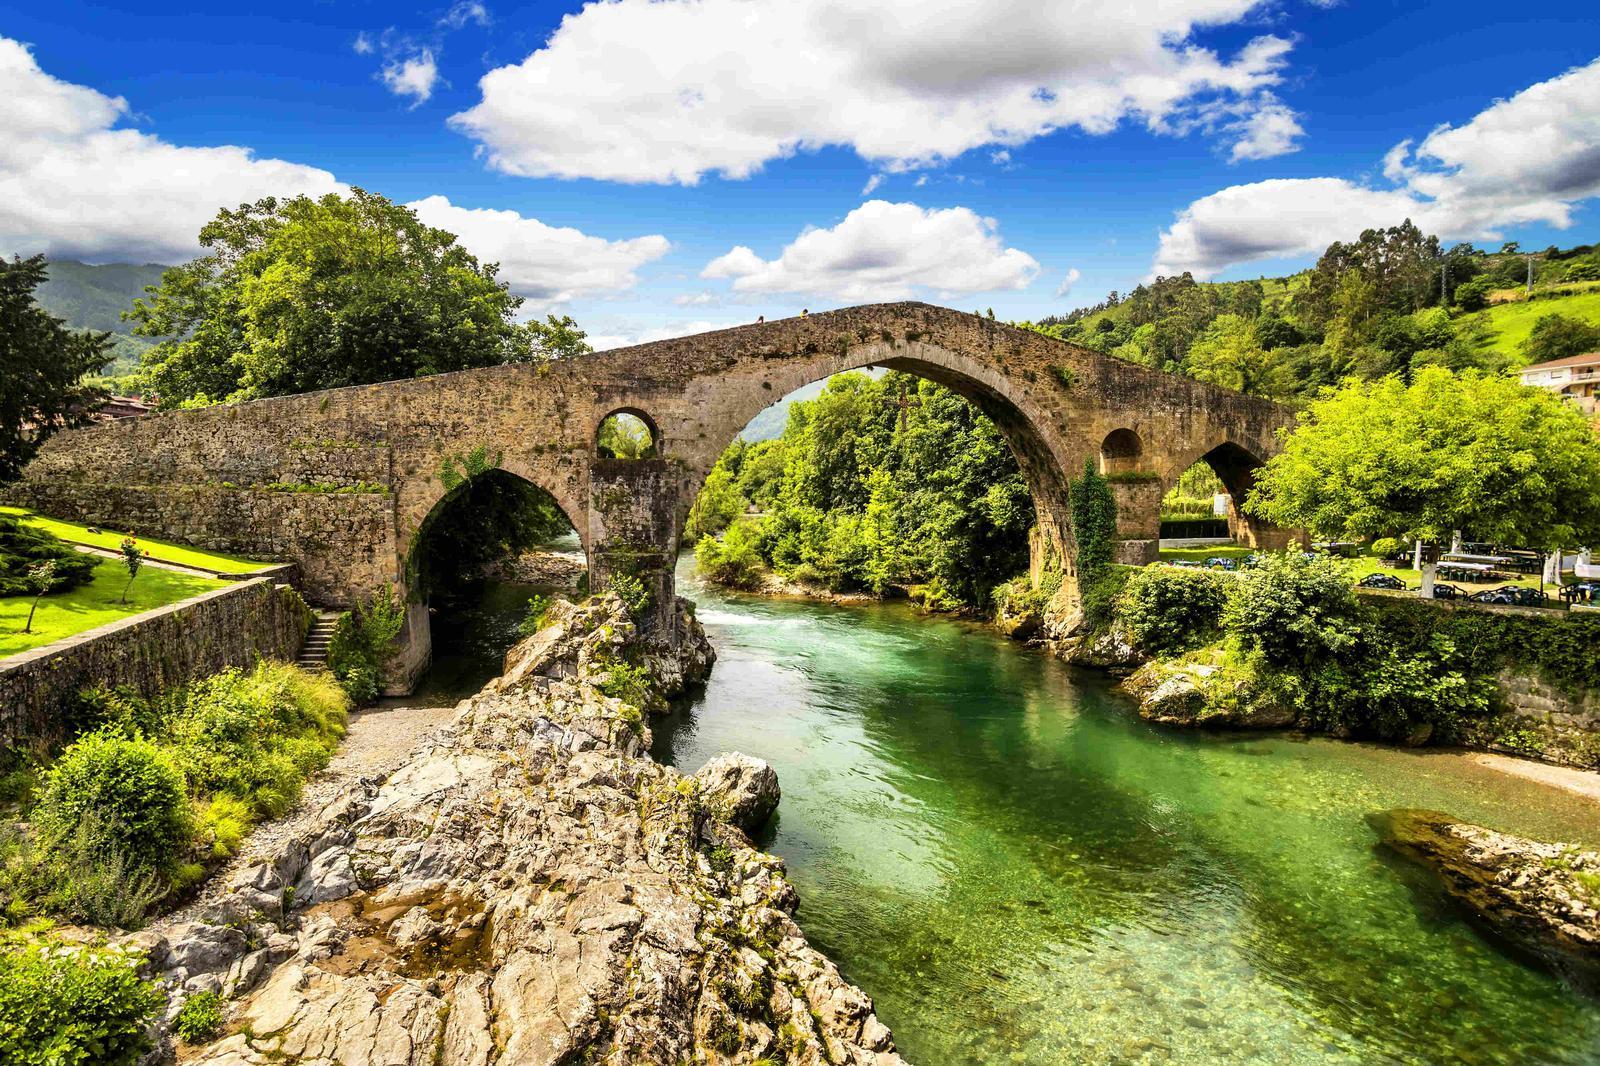 Turismo activo en espa a los 10 destinos imprescindibles for Hoteles con piscina asturias